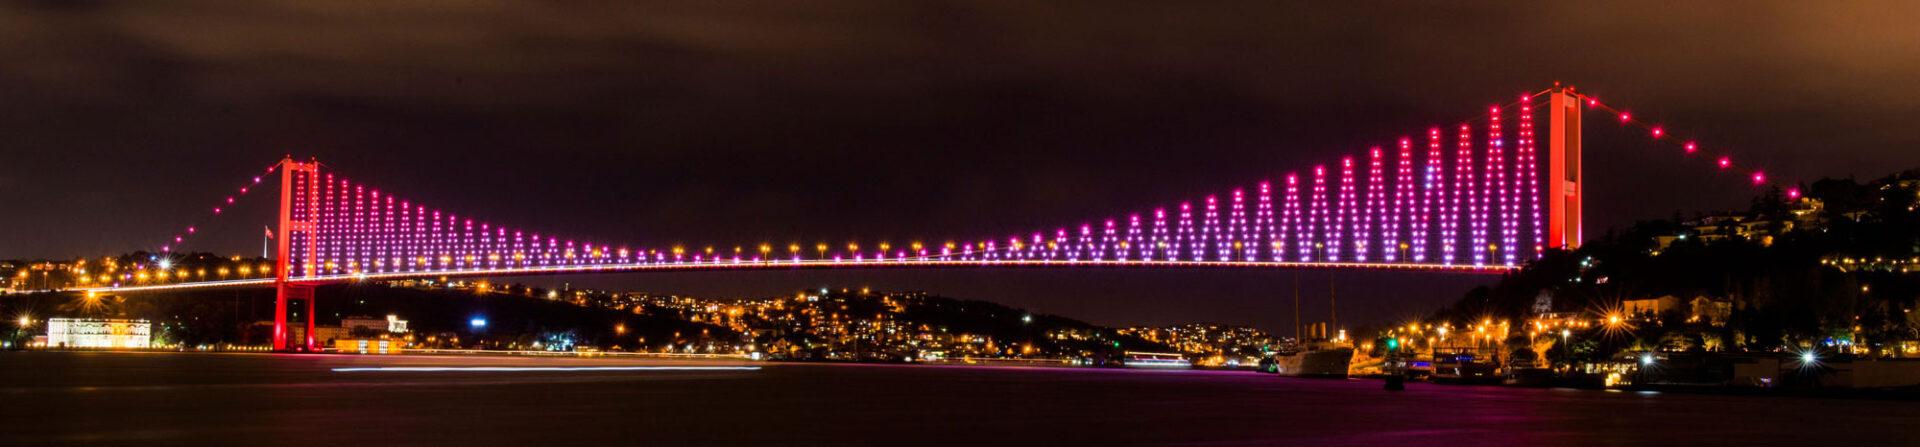 102506,istanbul2000lik